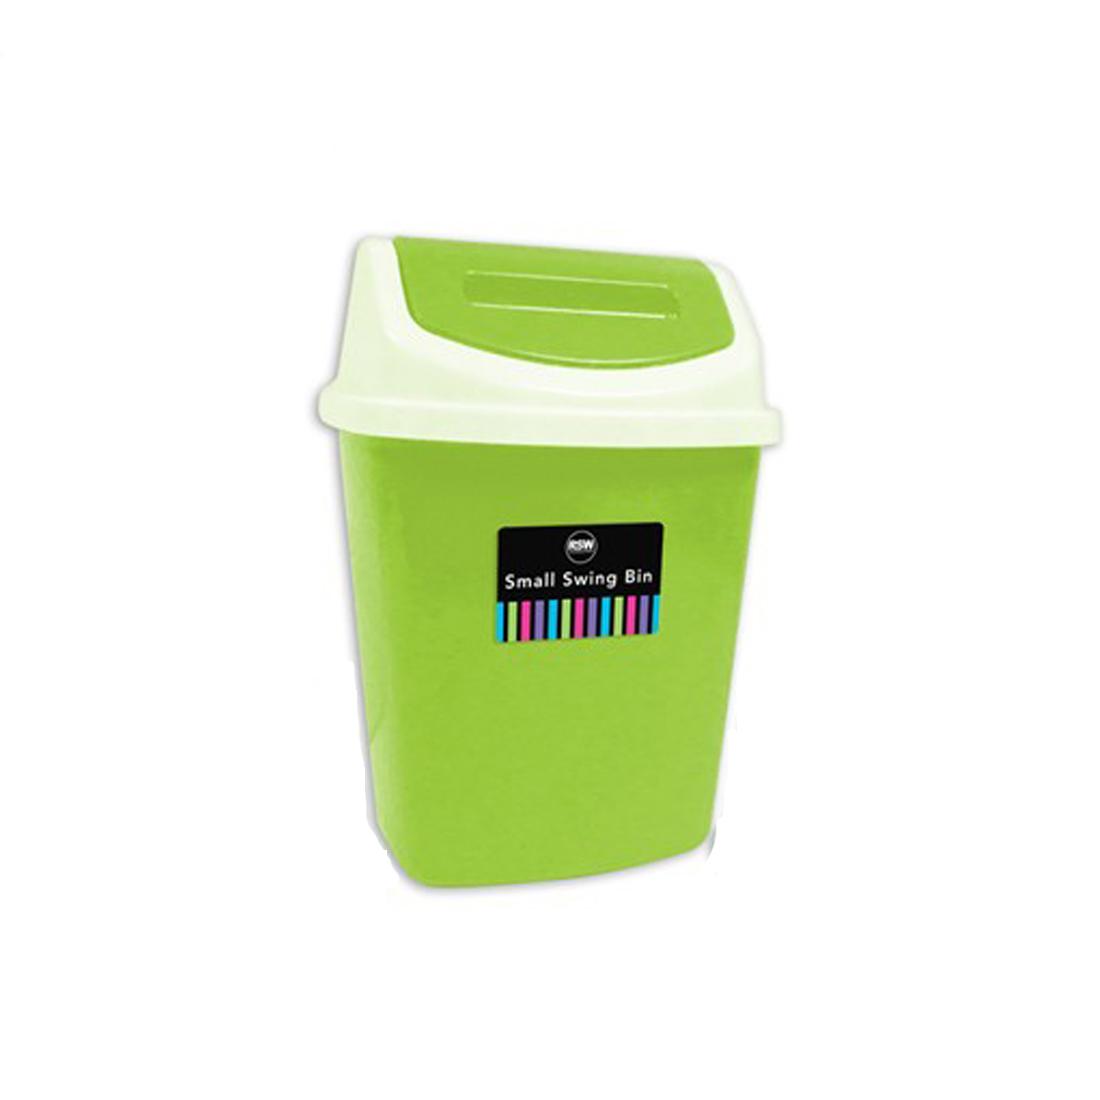 Swing bin plastic 5l capacity ideal for bathroom bedroom for Green bathroom bin